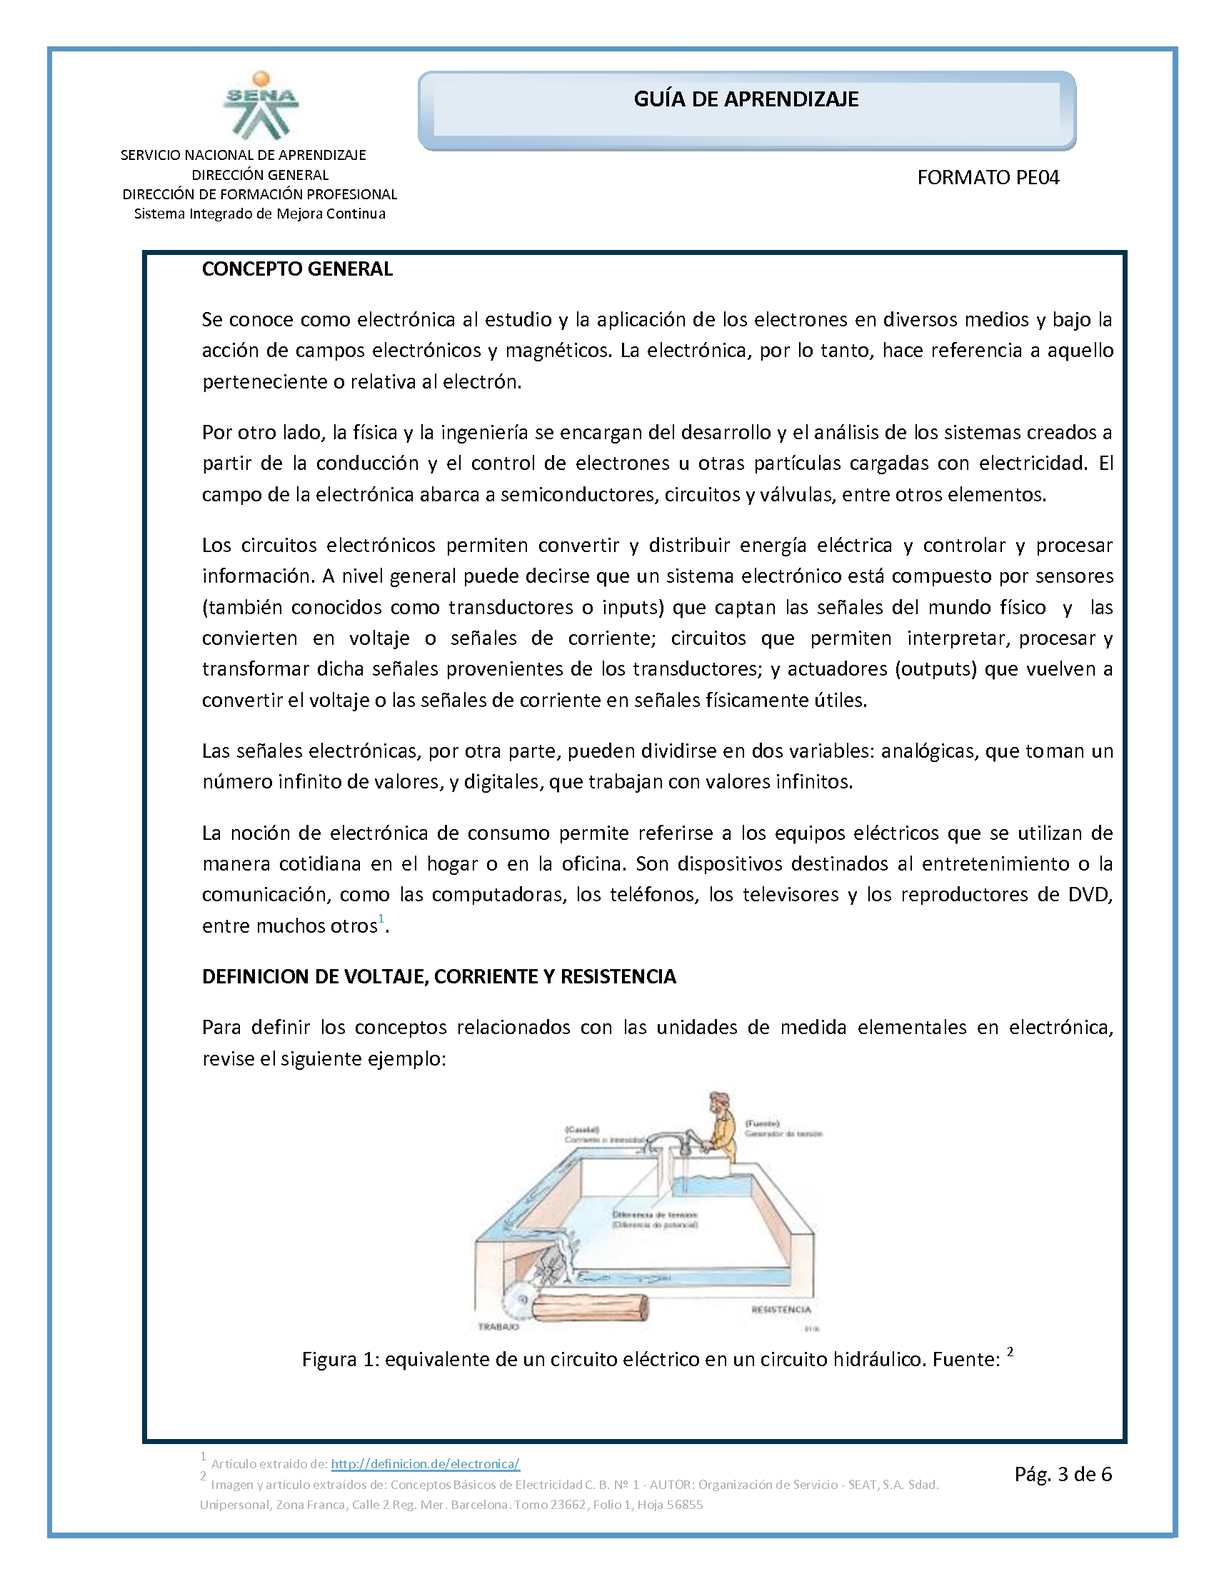 Circuito Hidraulico Mixto : GuÍa de electrÓnica sena calameo downloader